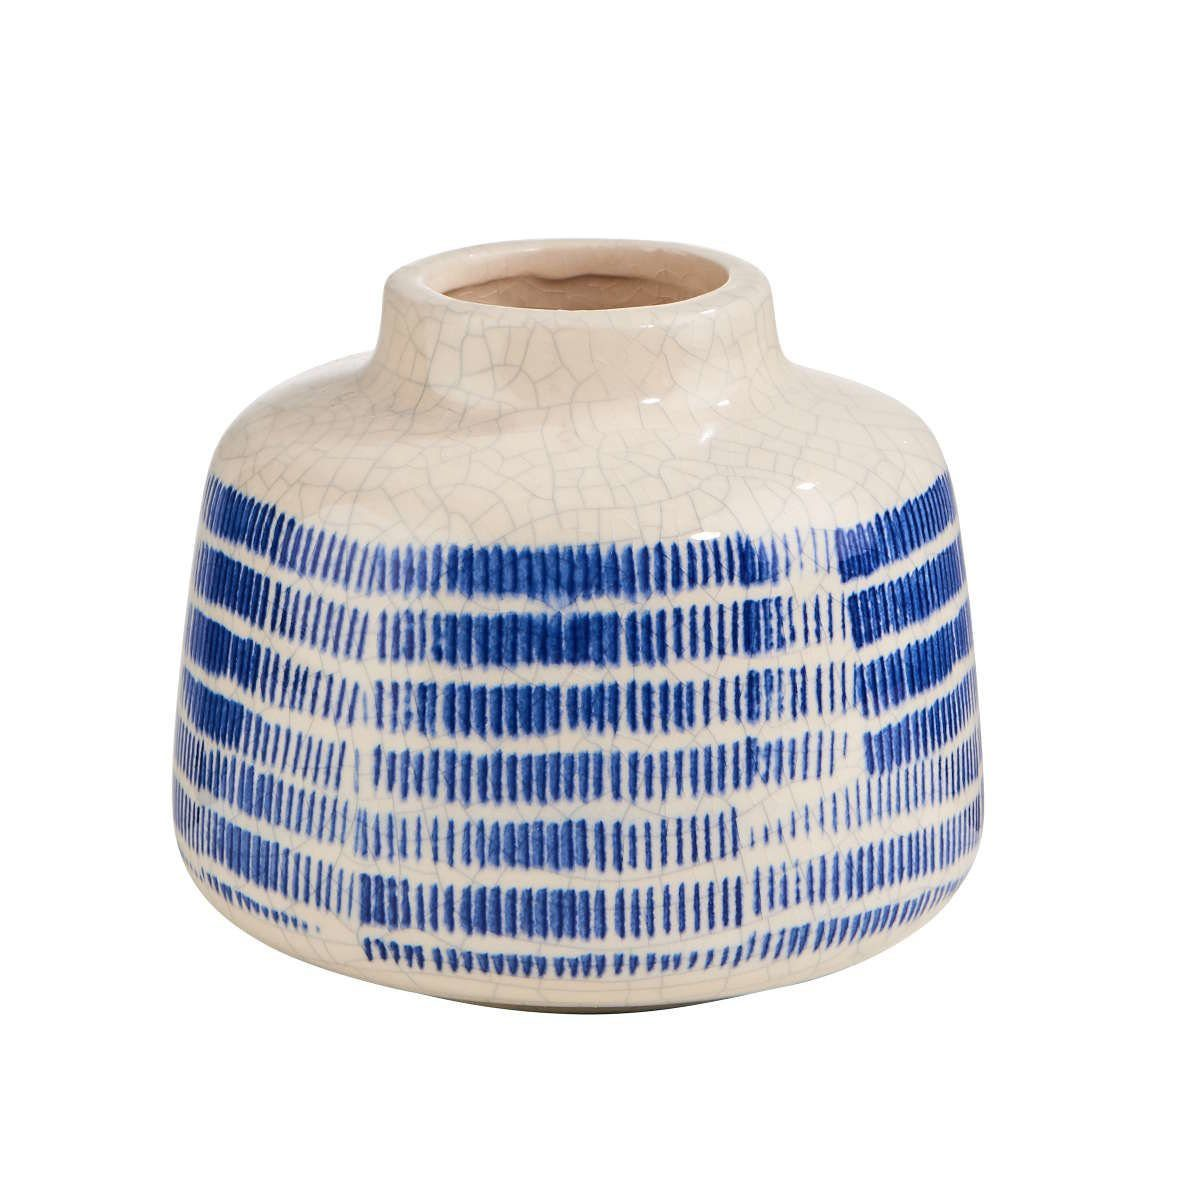 BUTLERS COTE SAUVAGE »Vase Ø 11,5 cm«